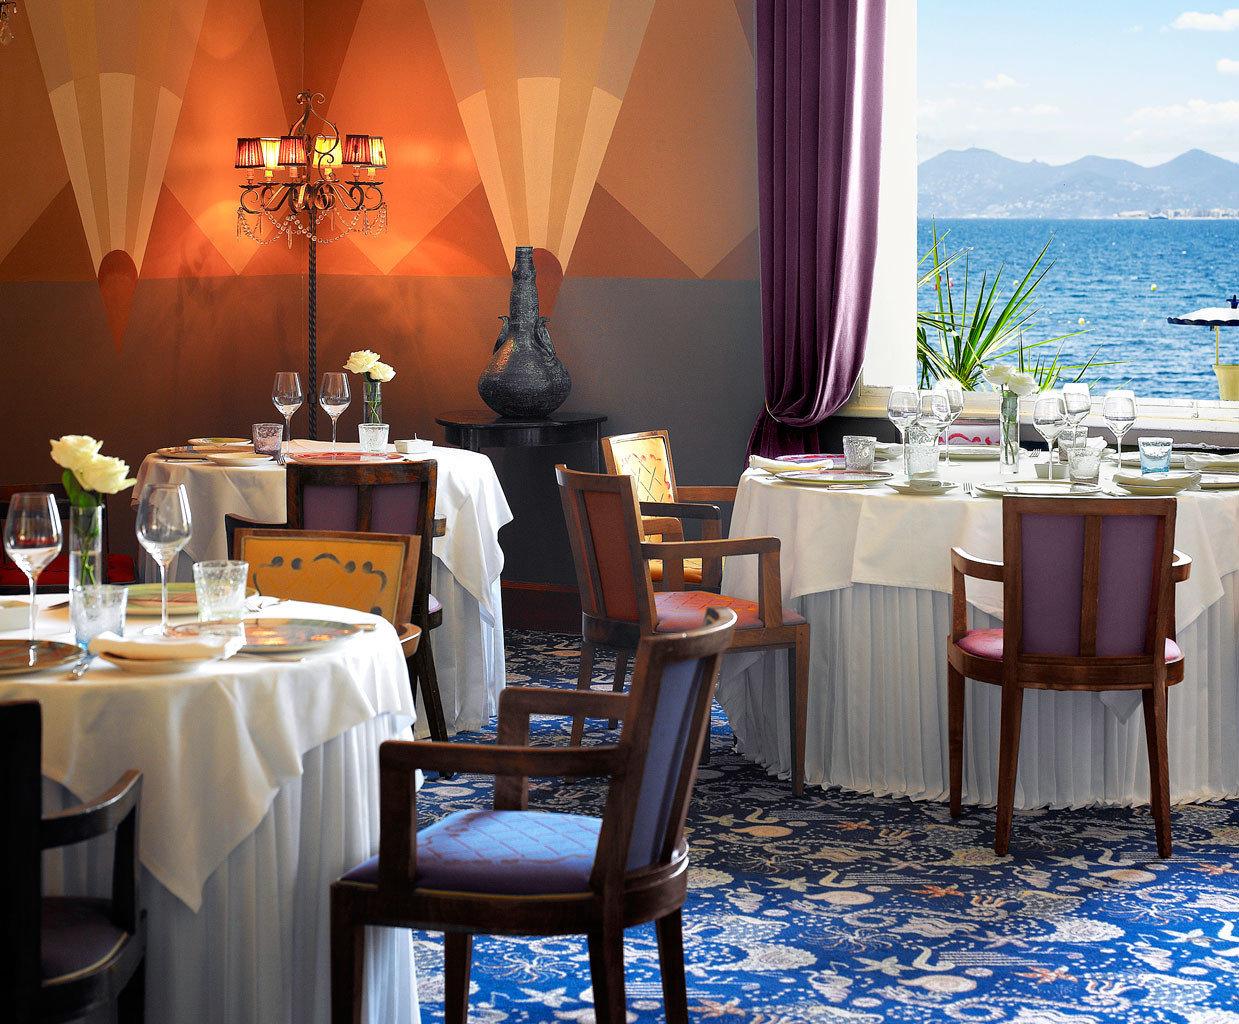 Beachfront Dining Drink Eat restaurant function hall Resort Suite